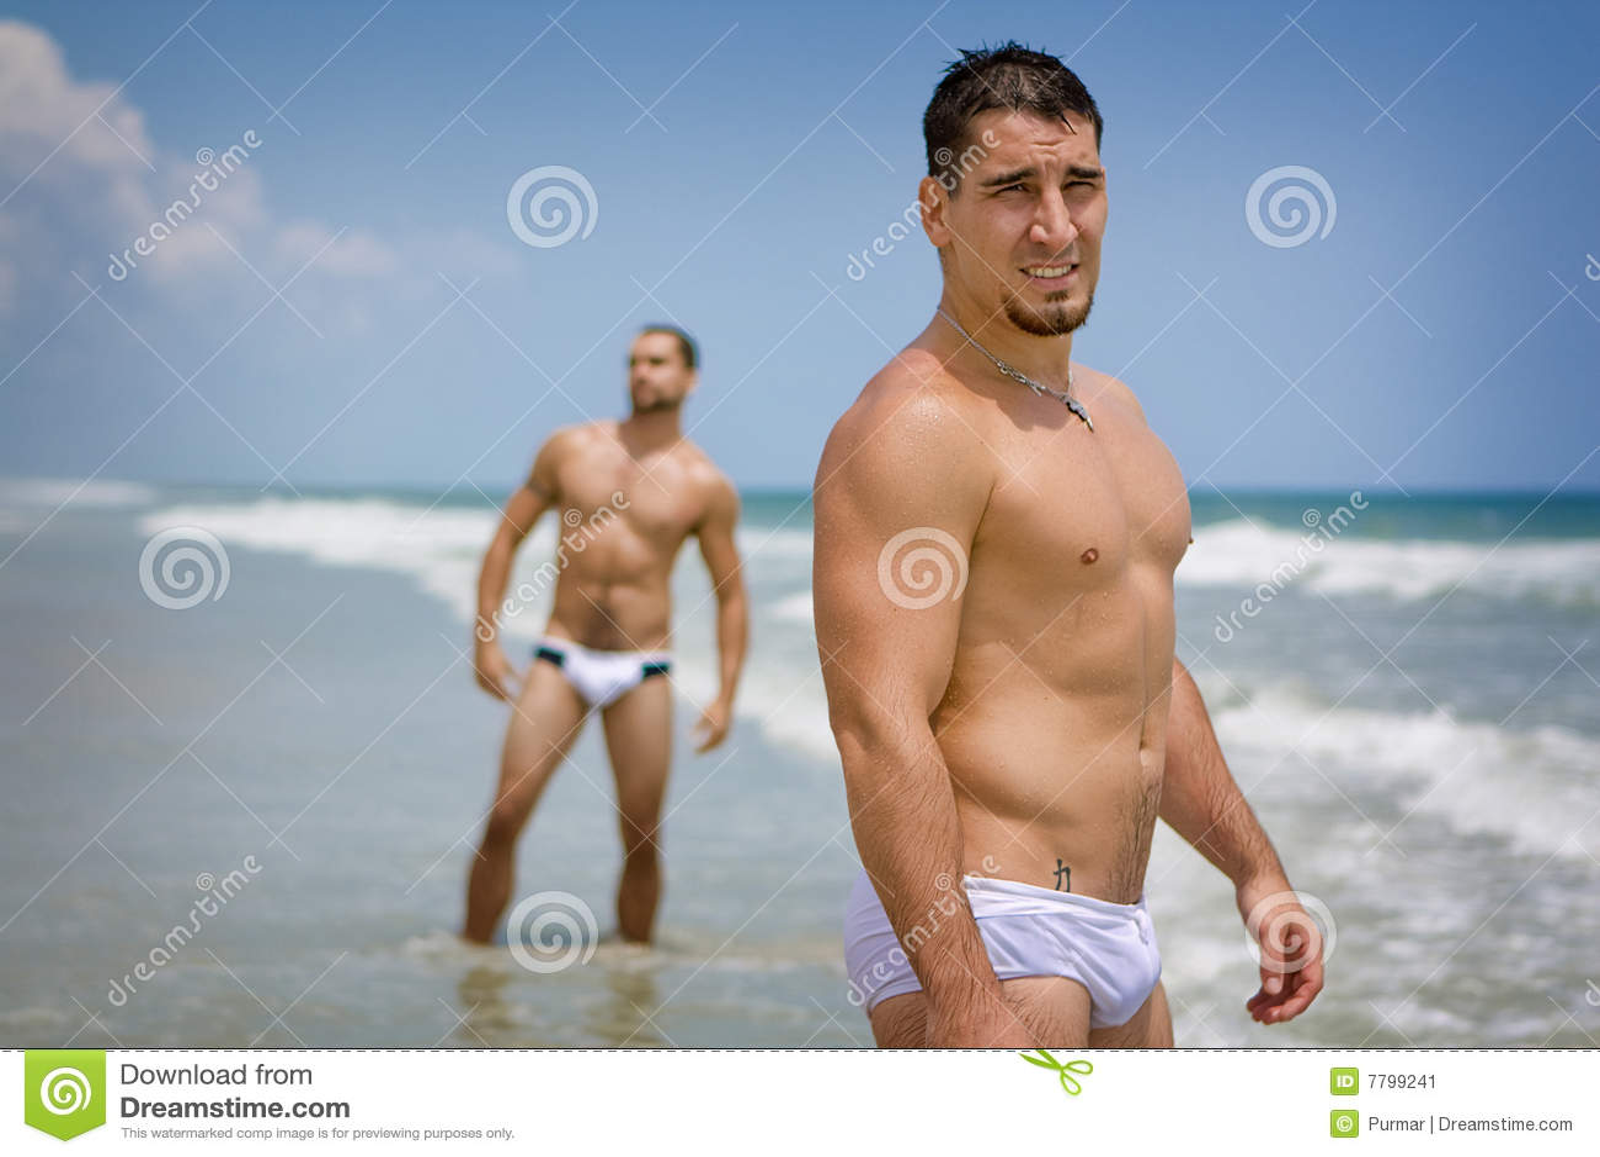 pics of naked lesbians having sex